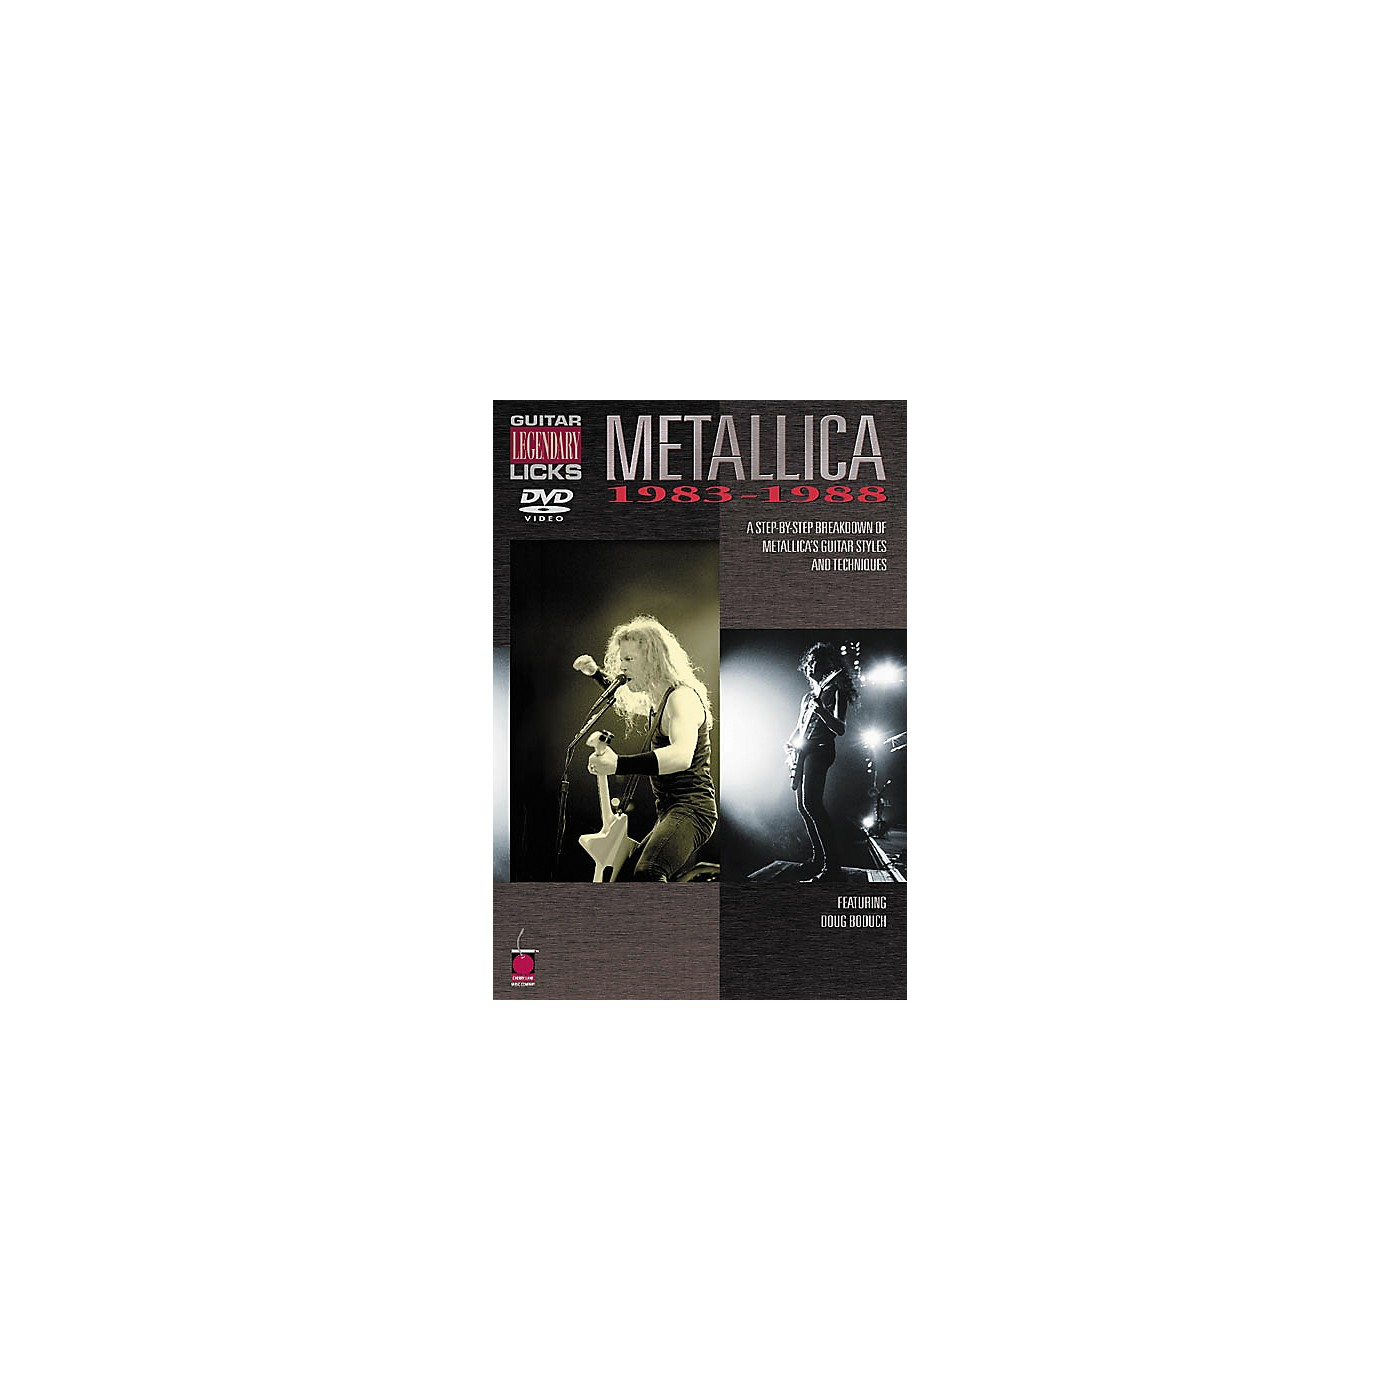 Cherry Lane Metallica - Guitar Legendary Licks 1983-1988 (DVD) thumbnail